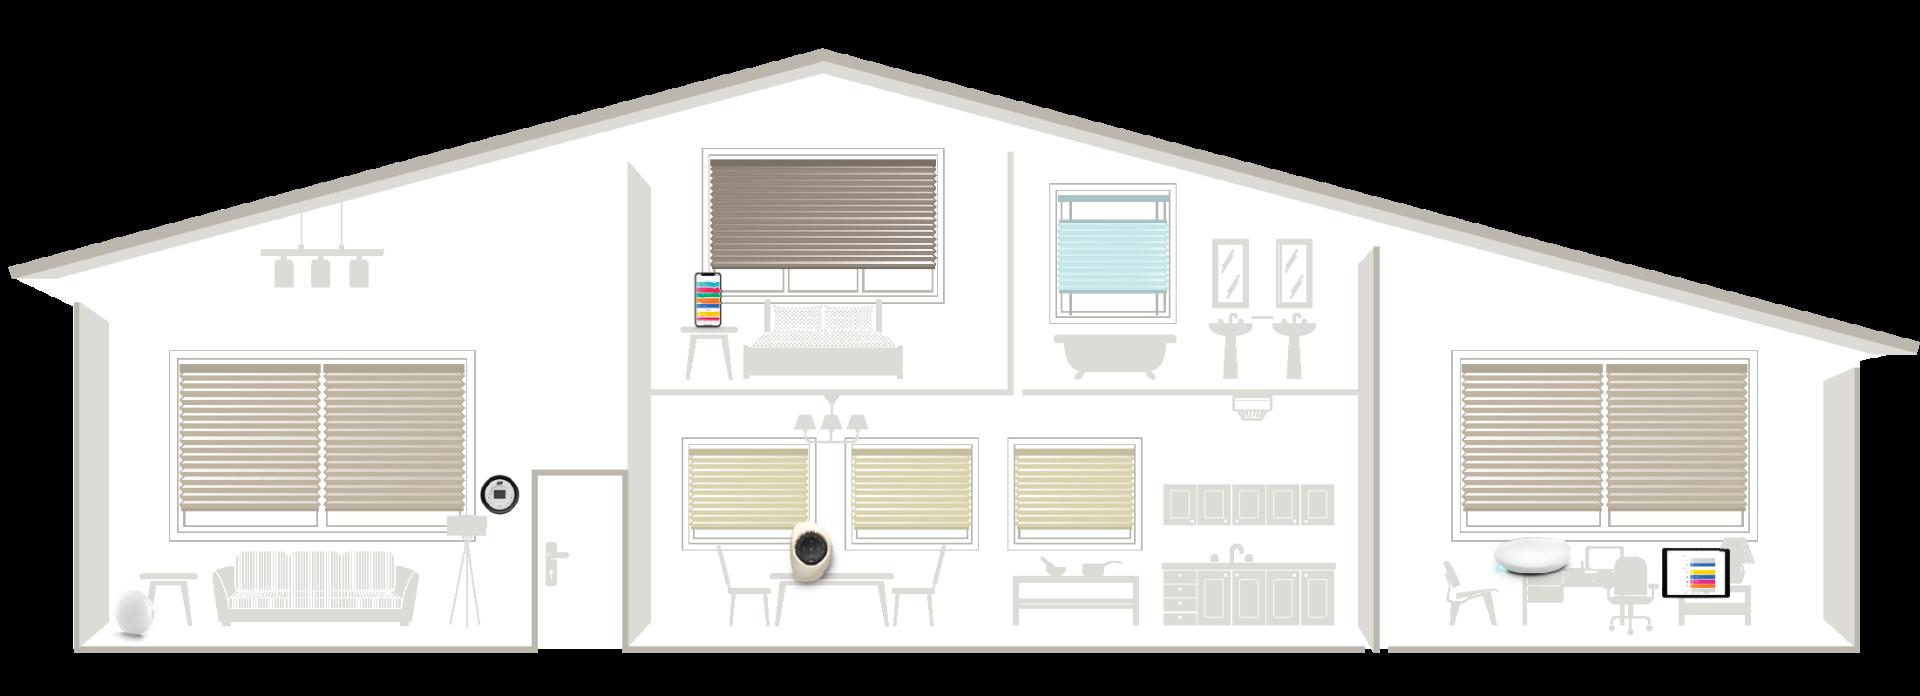 Haus Szenario mit Powerview